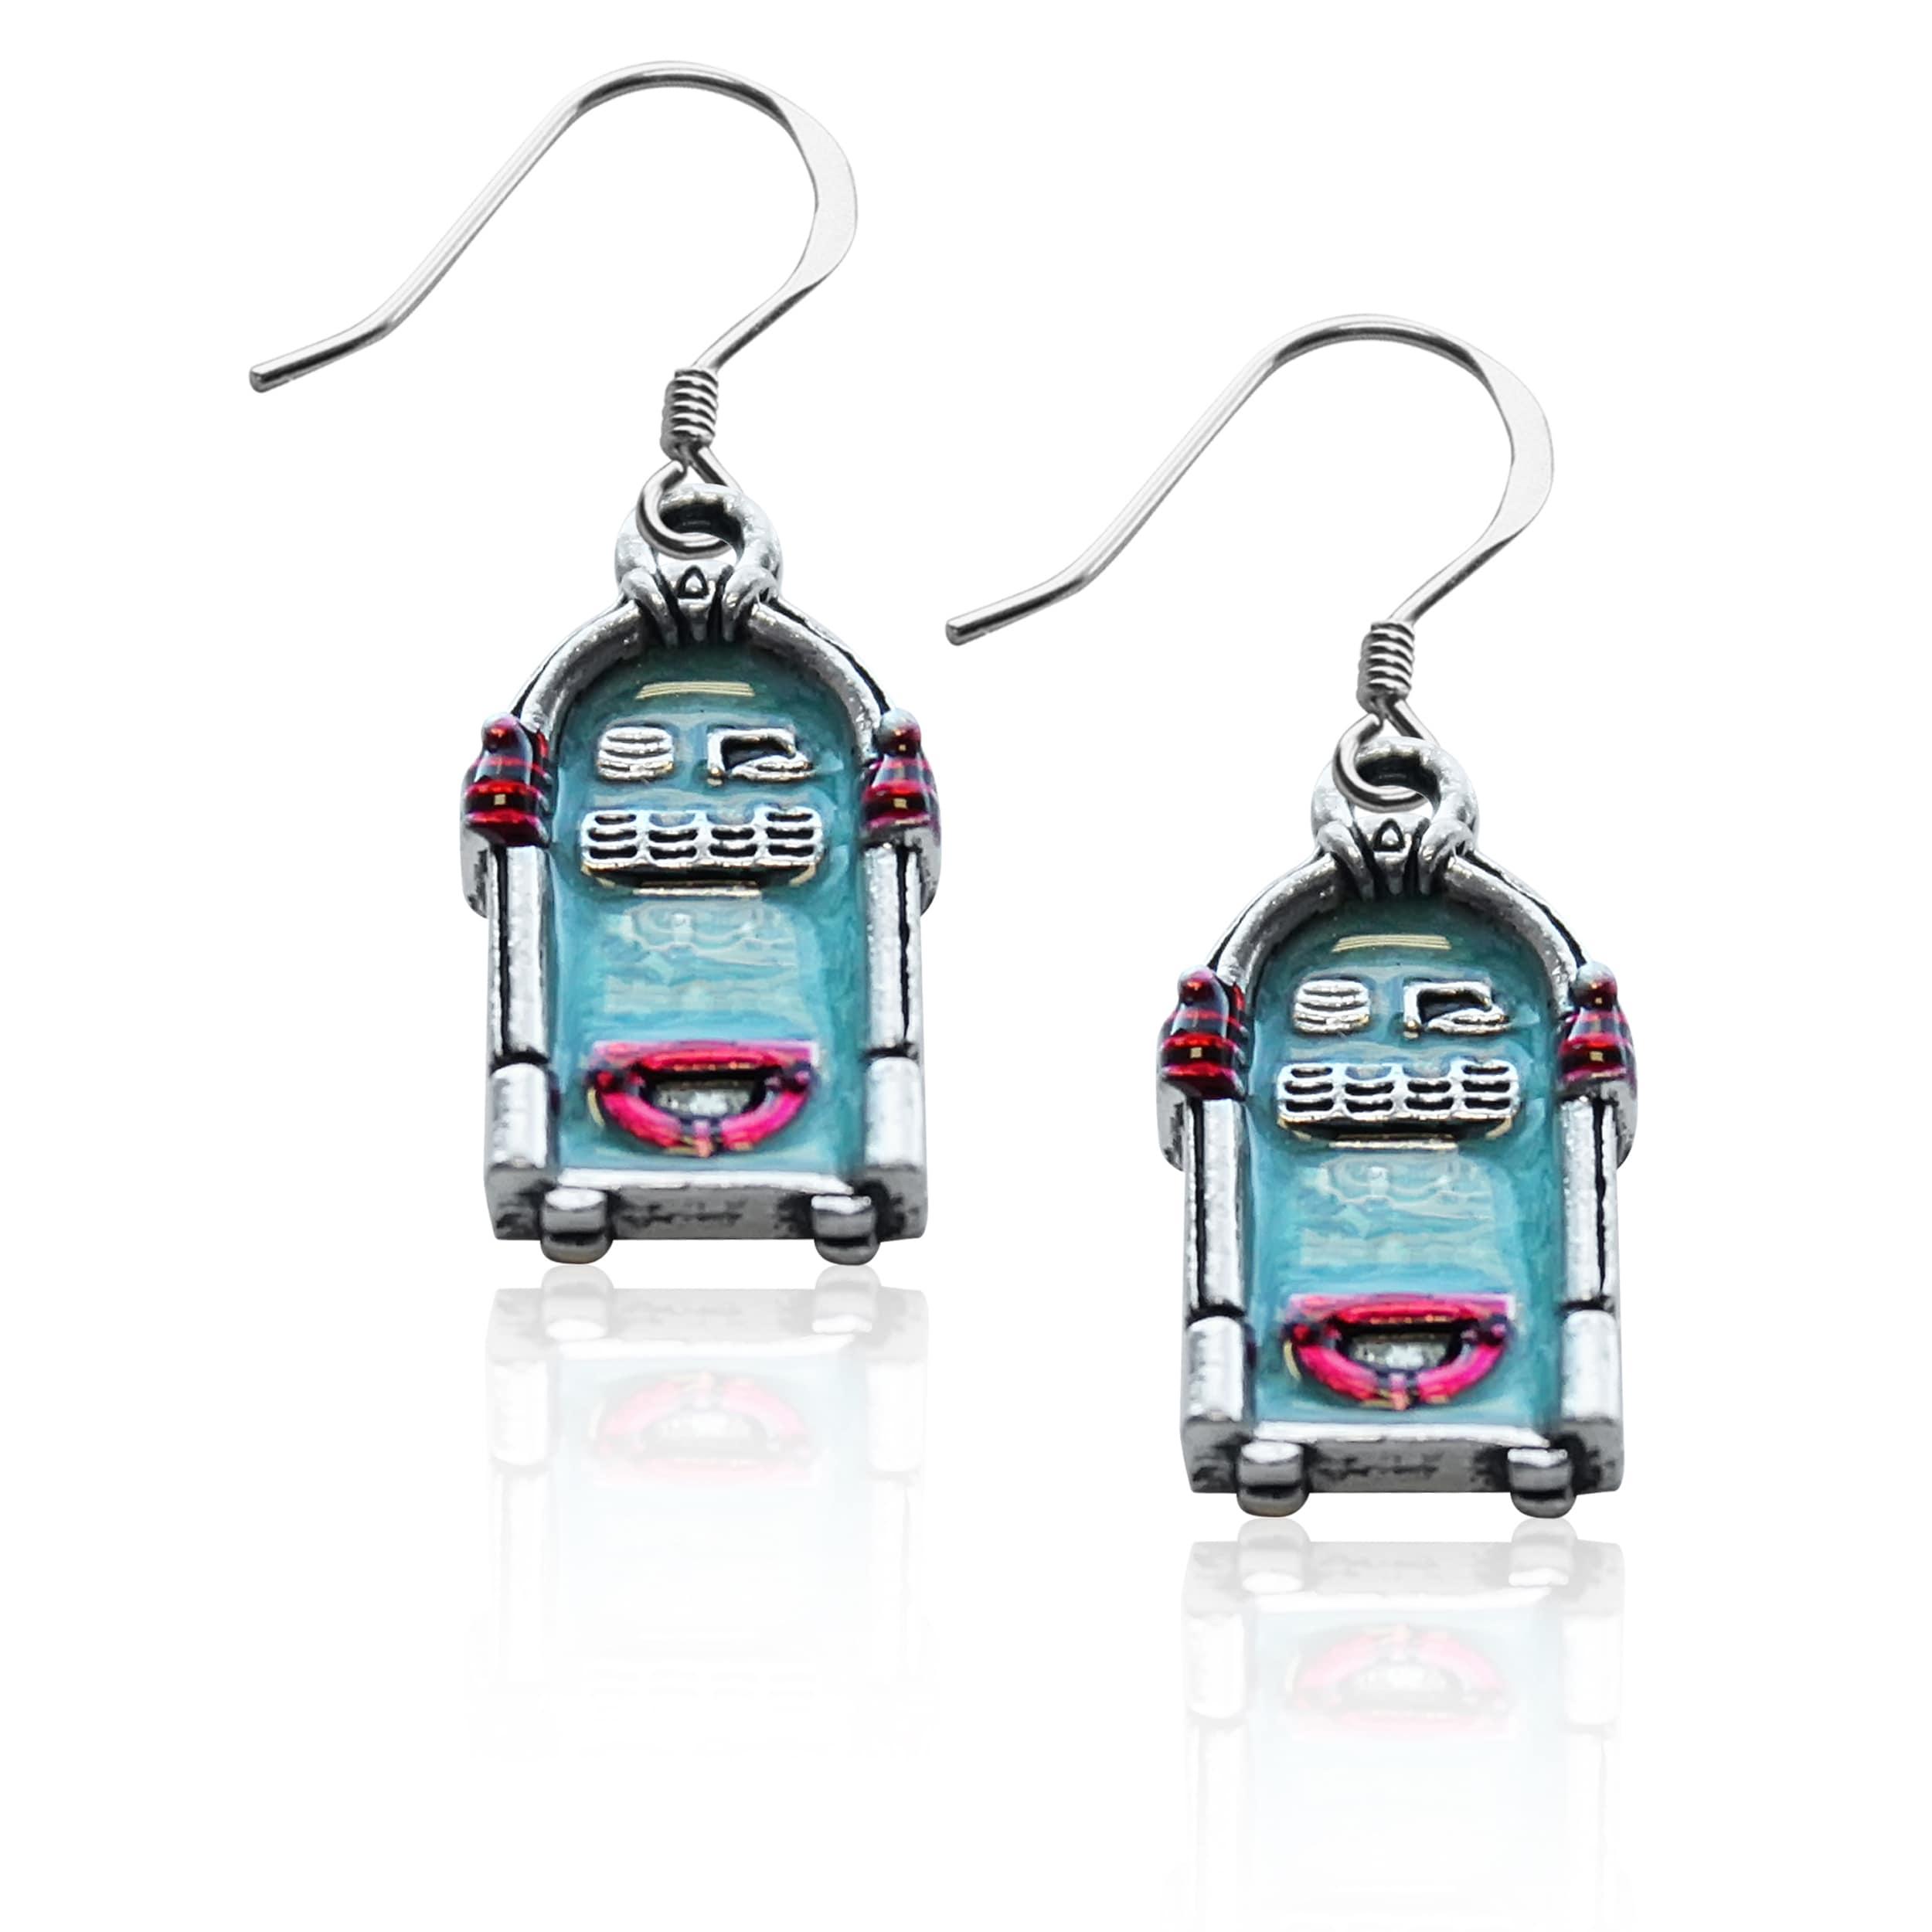 Whimsical Sterling Silver Jukebox Charm Earrings (Sterlin...